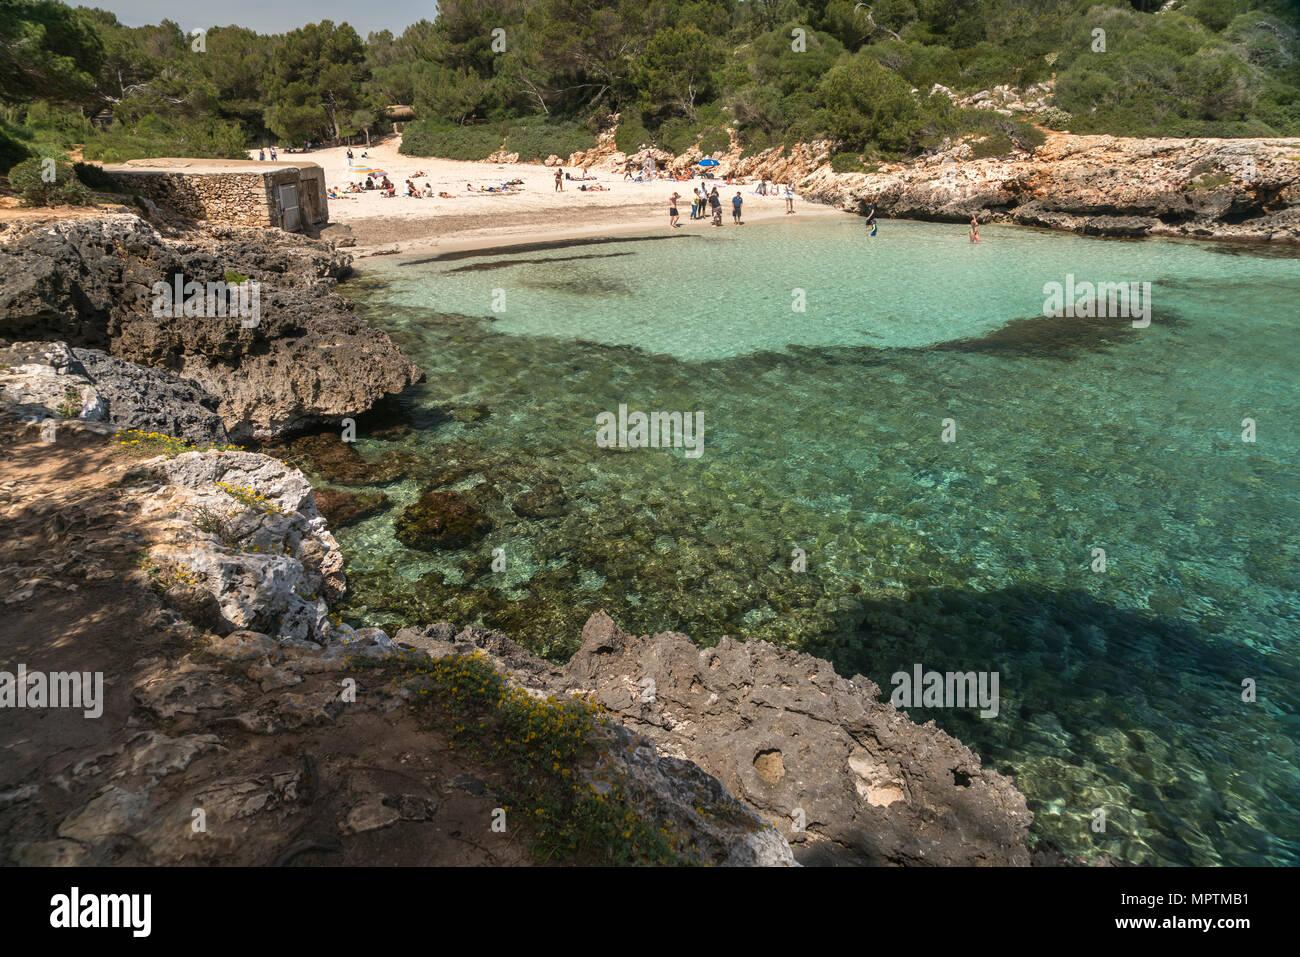 Cala Sa Nau, Felanitx, Mallorca, Balearen, Spanien  | Cala Sa Nau, Felanitx, Majorca, Balearic Islands, Spain, - Stock Image